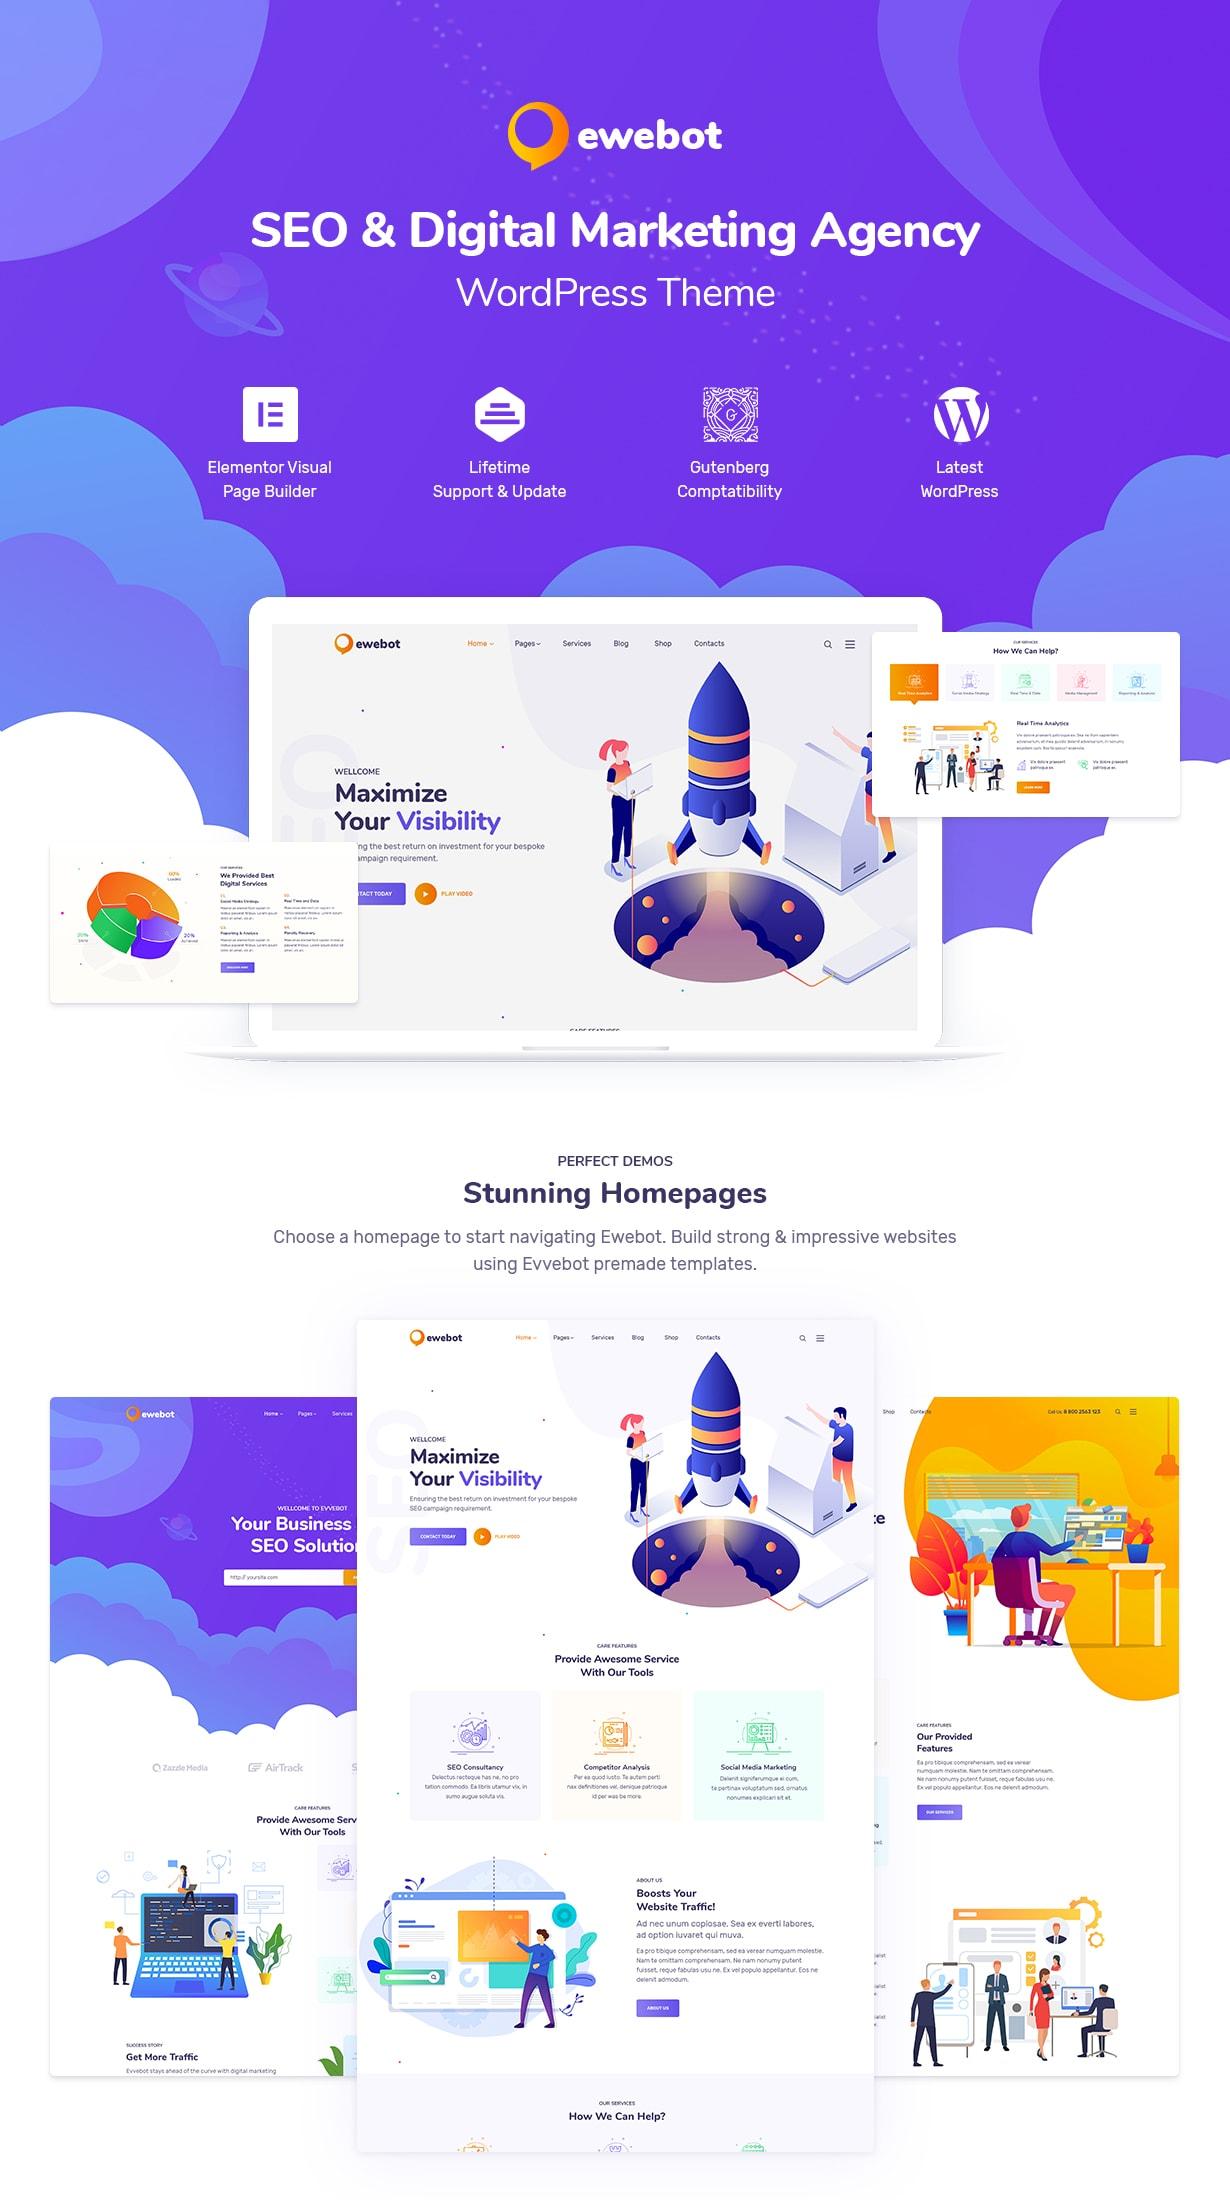 ewebot wp1 - Ewebot - SEO Marketing & Digital Agency